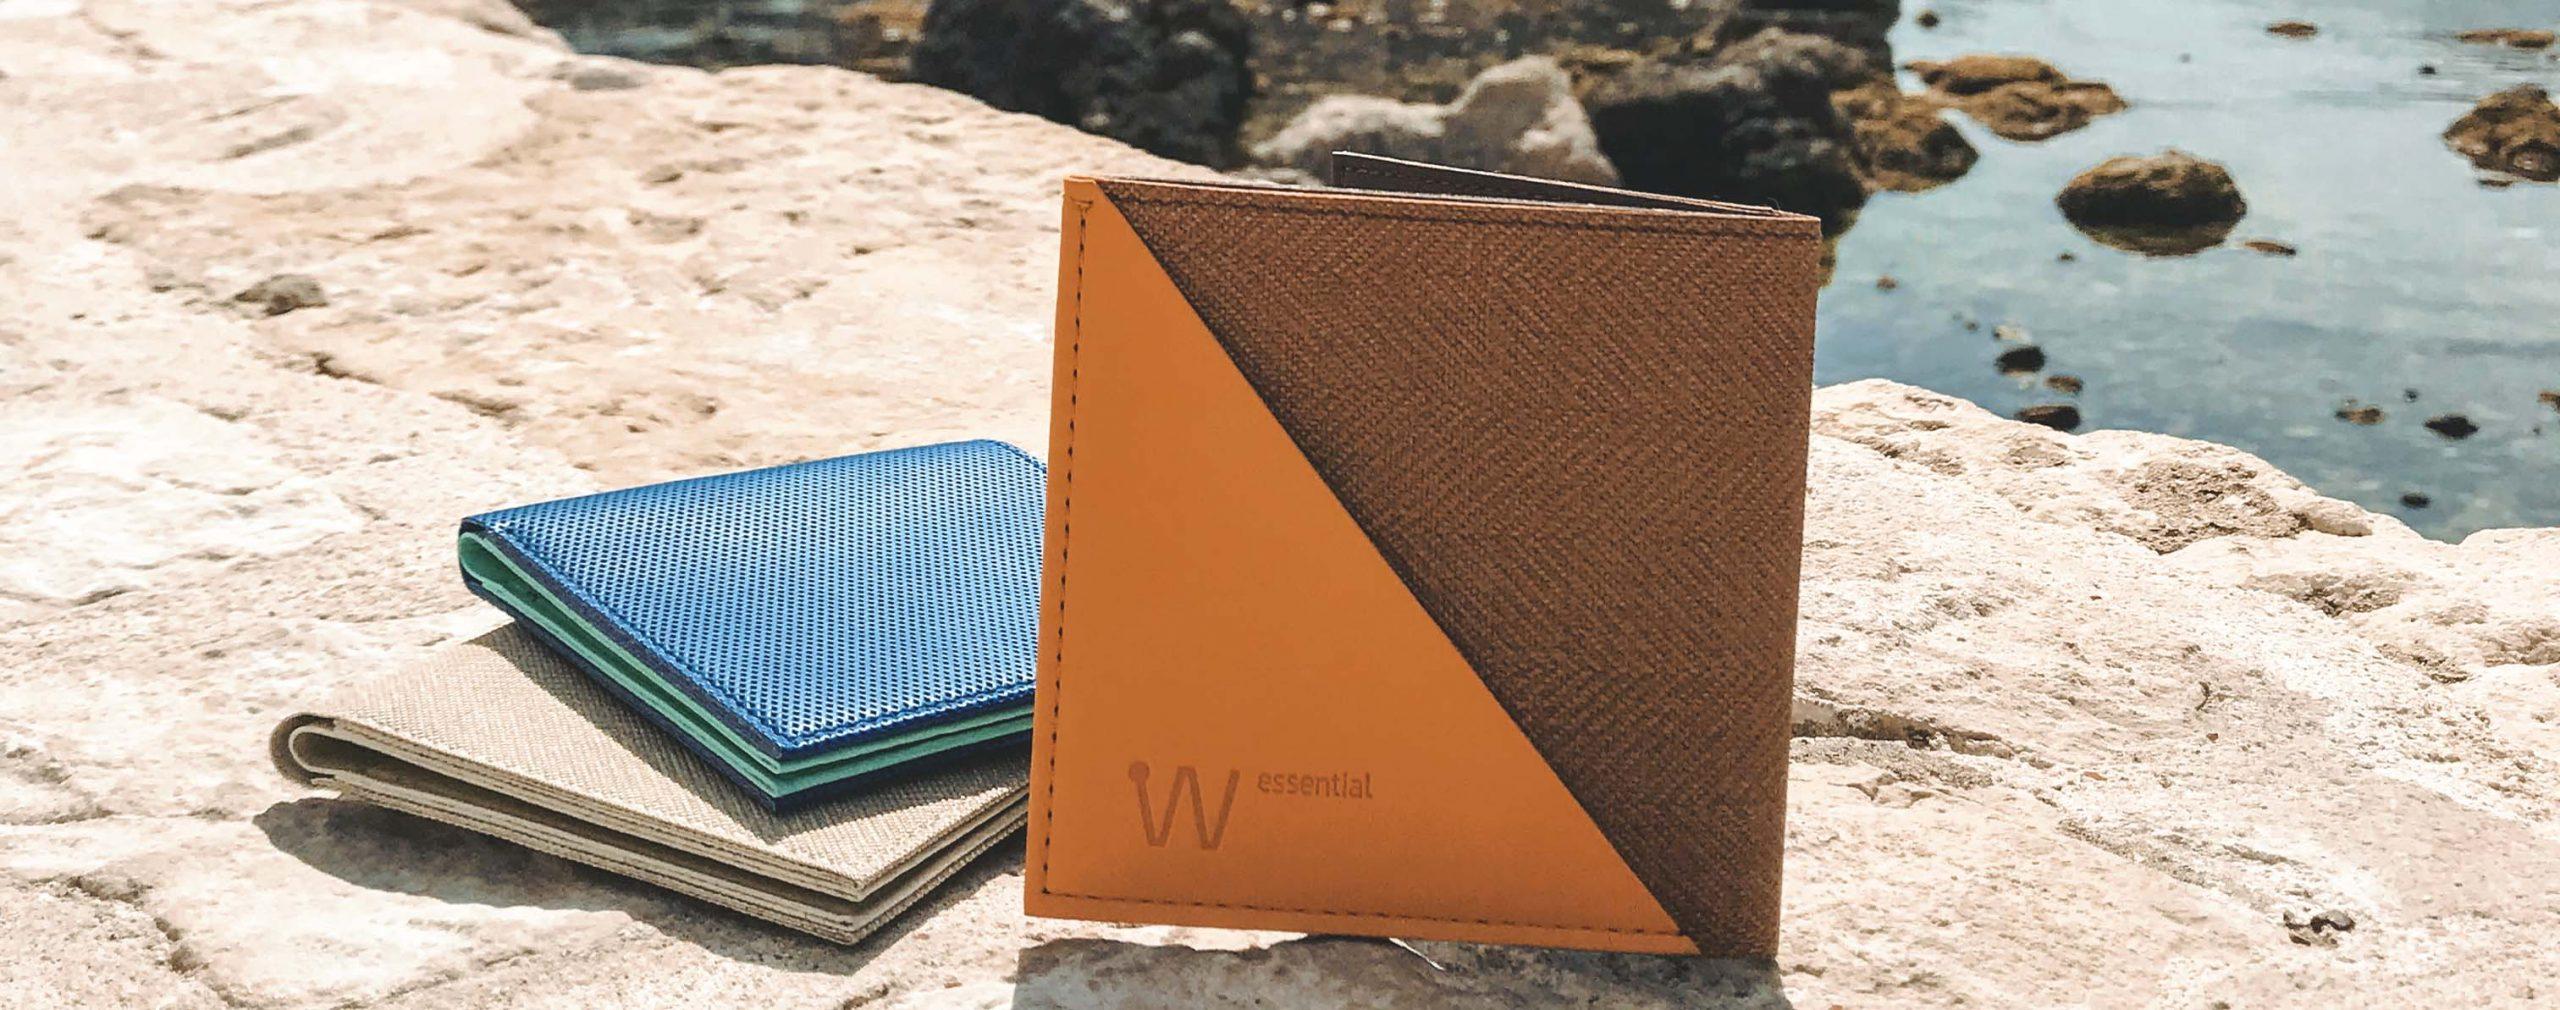 RFID protected Baggizmo Wiseward Essential wallet